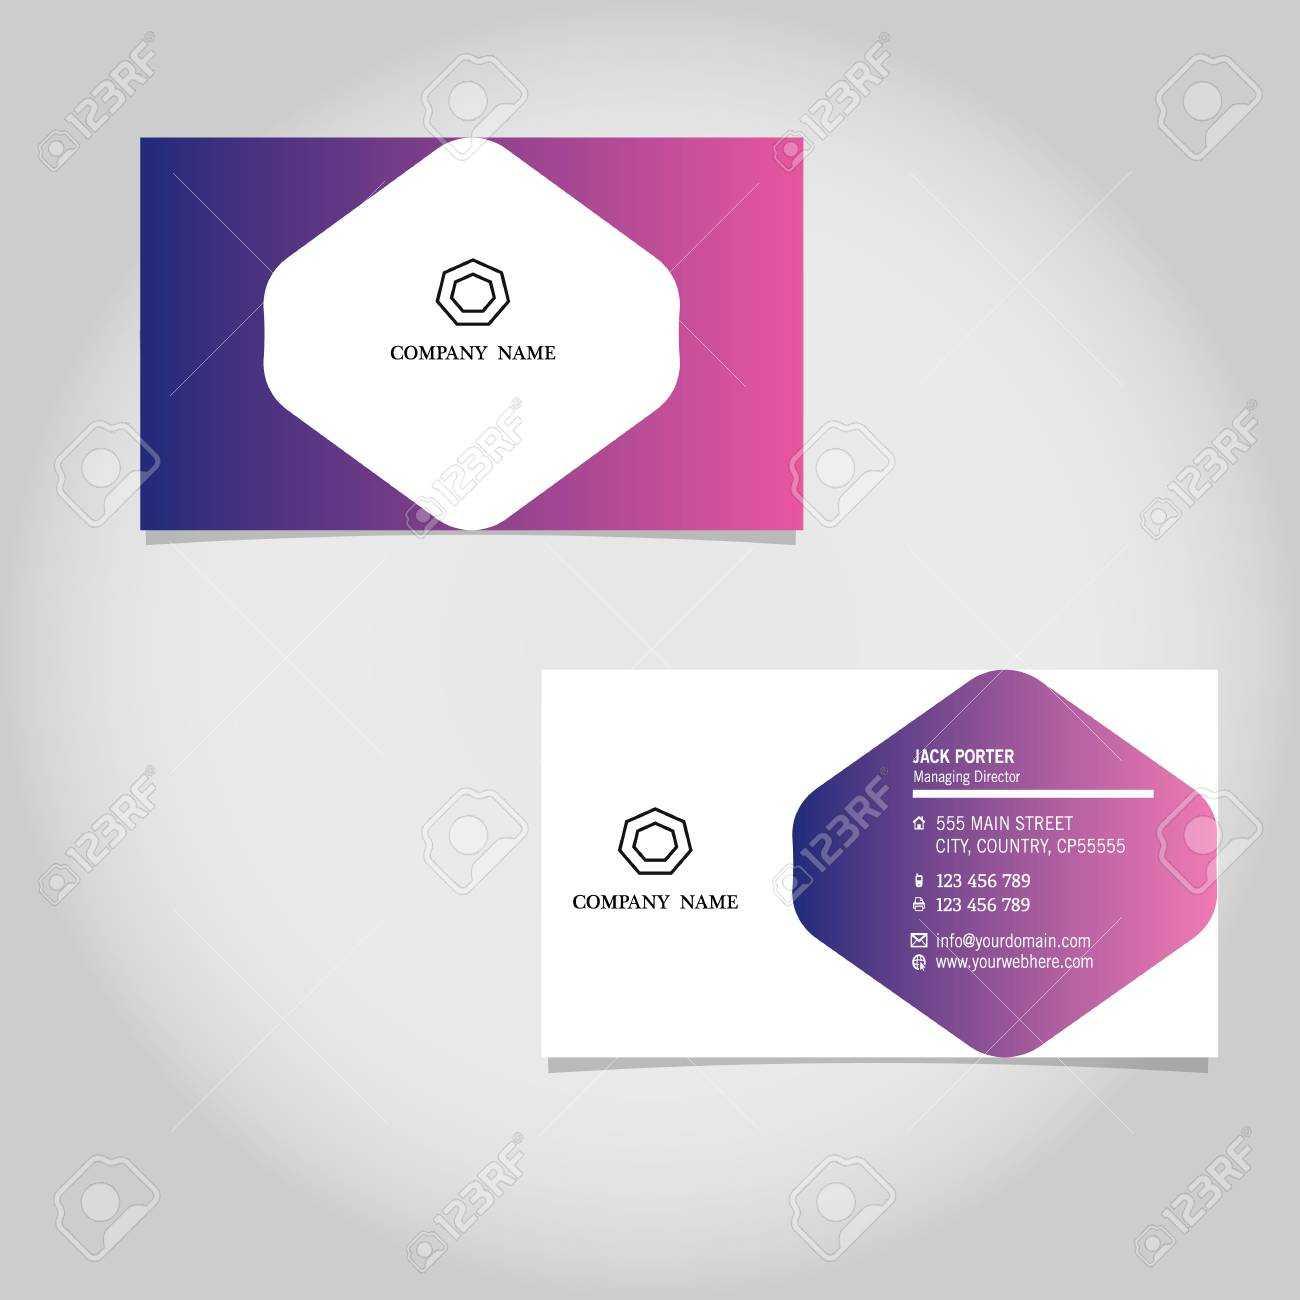 Vector Business Card Template Design Adobe Illustrator Throughout Adobe Illustrator Card Template